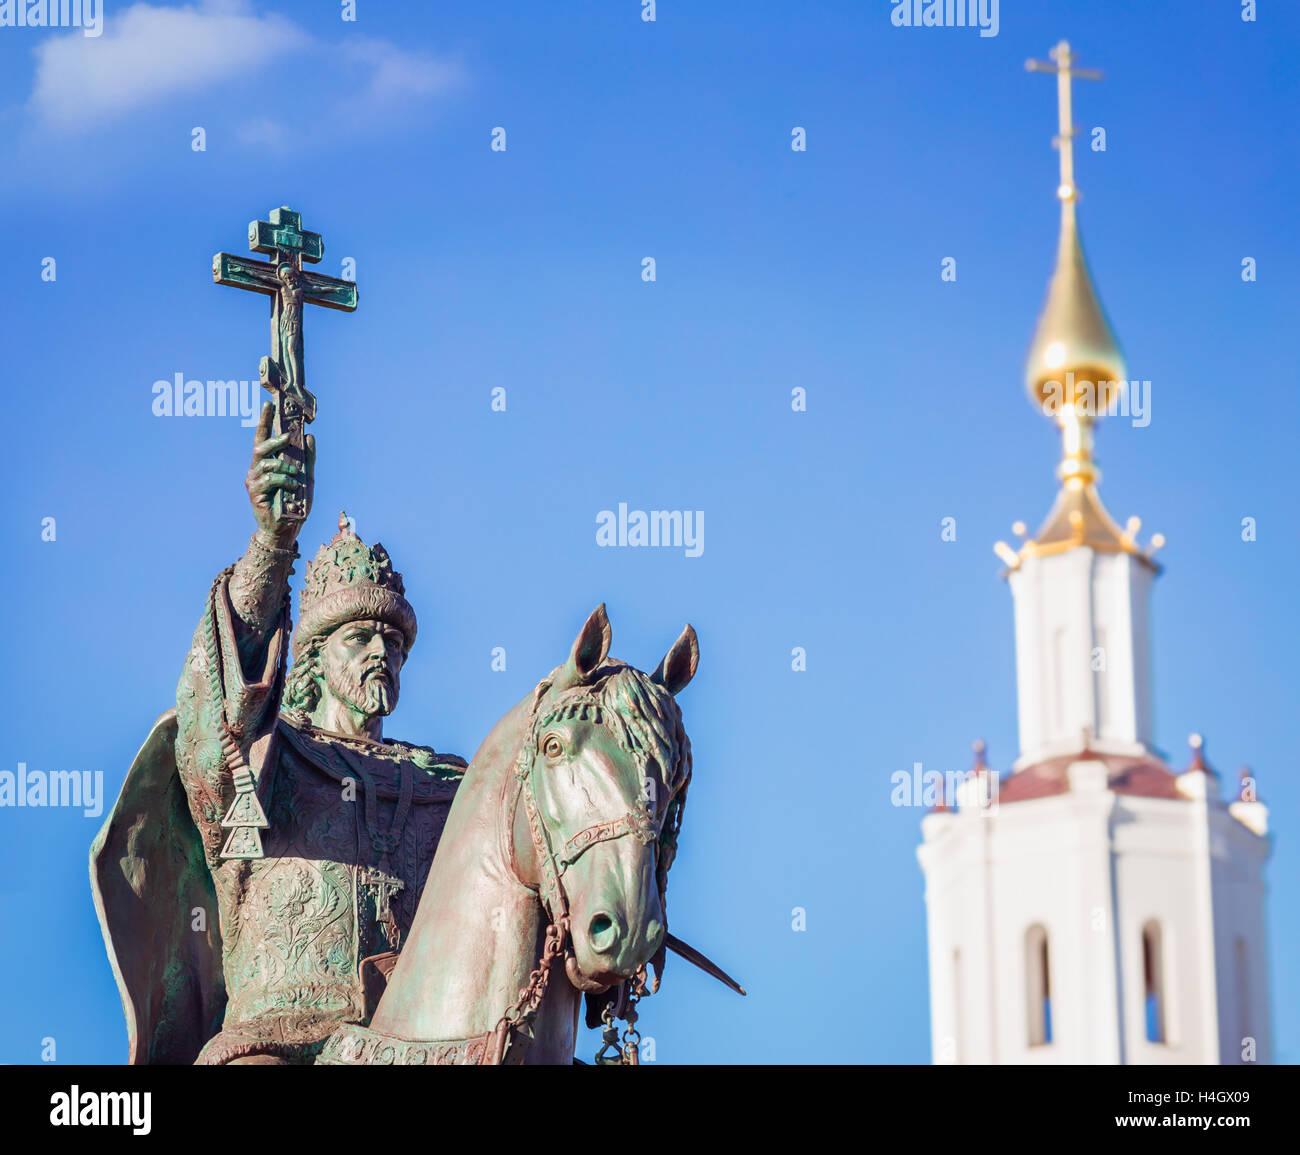 Tsar Ivan IV monument in Oryol Stock Photo